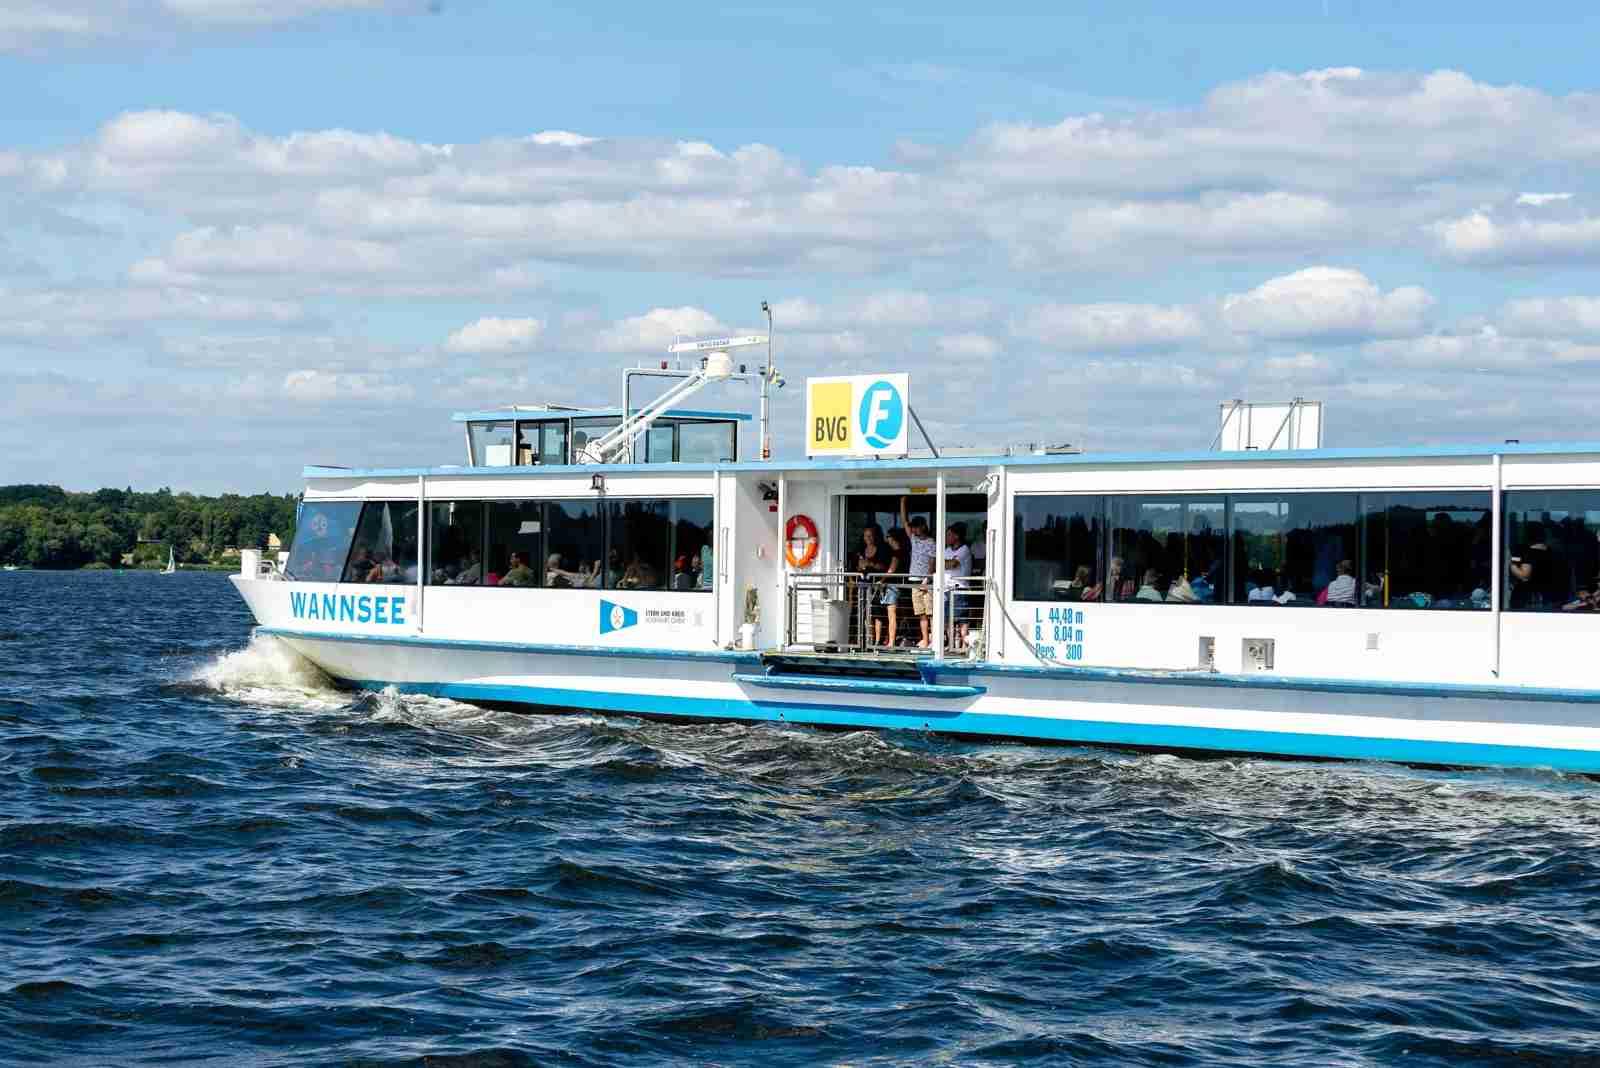 The F10 Ferry on Großer Wannsee. (Photo by gph foto.de/Shutterstock)